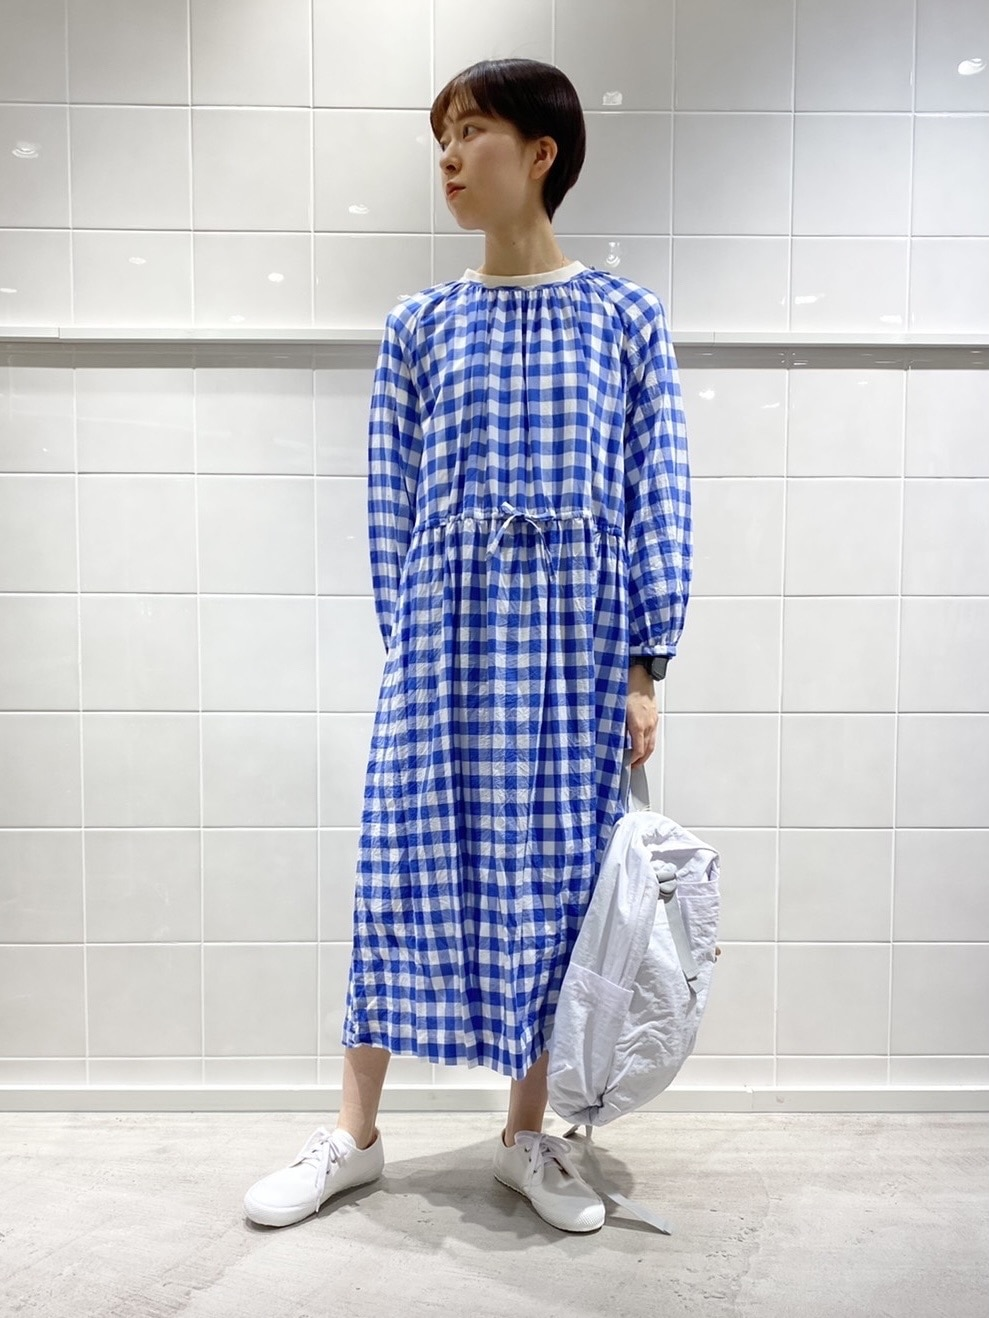 - CHILD WOMAN CHILD WOMAN , PAR ICI ルミネ横浜 身長:158cm 2021.03.12